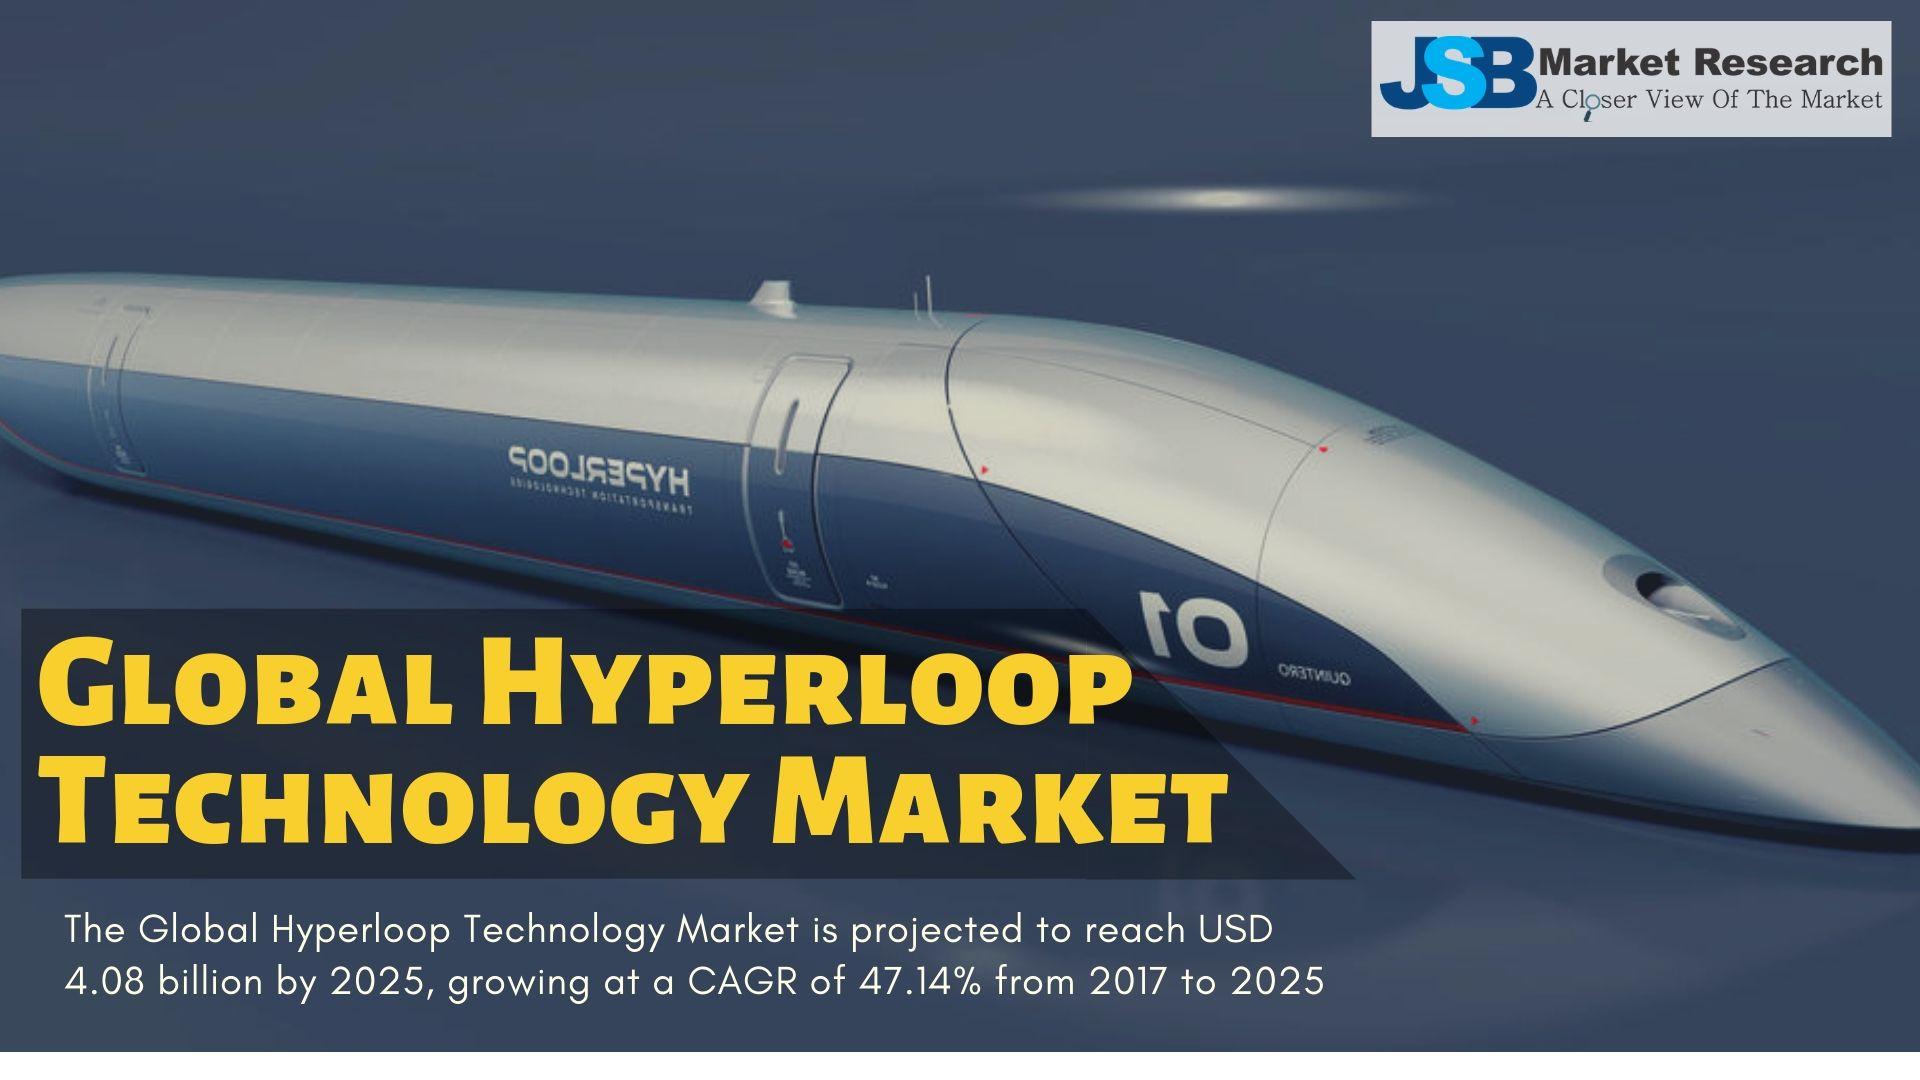 Global Hyperloop Technology Market Technology Transportation Technology Growth Strategy